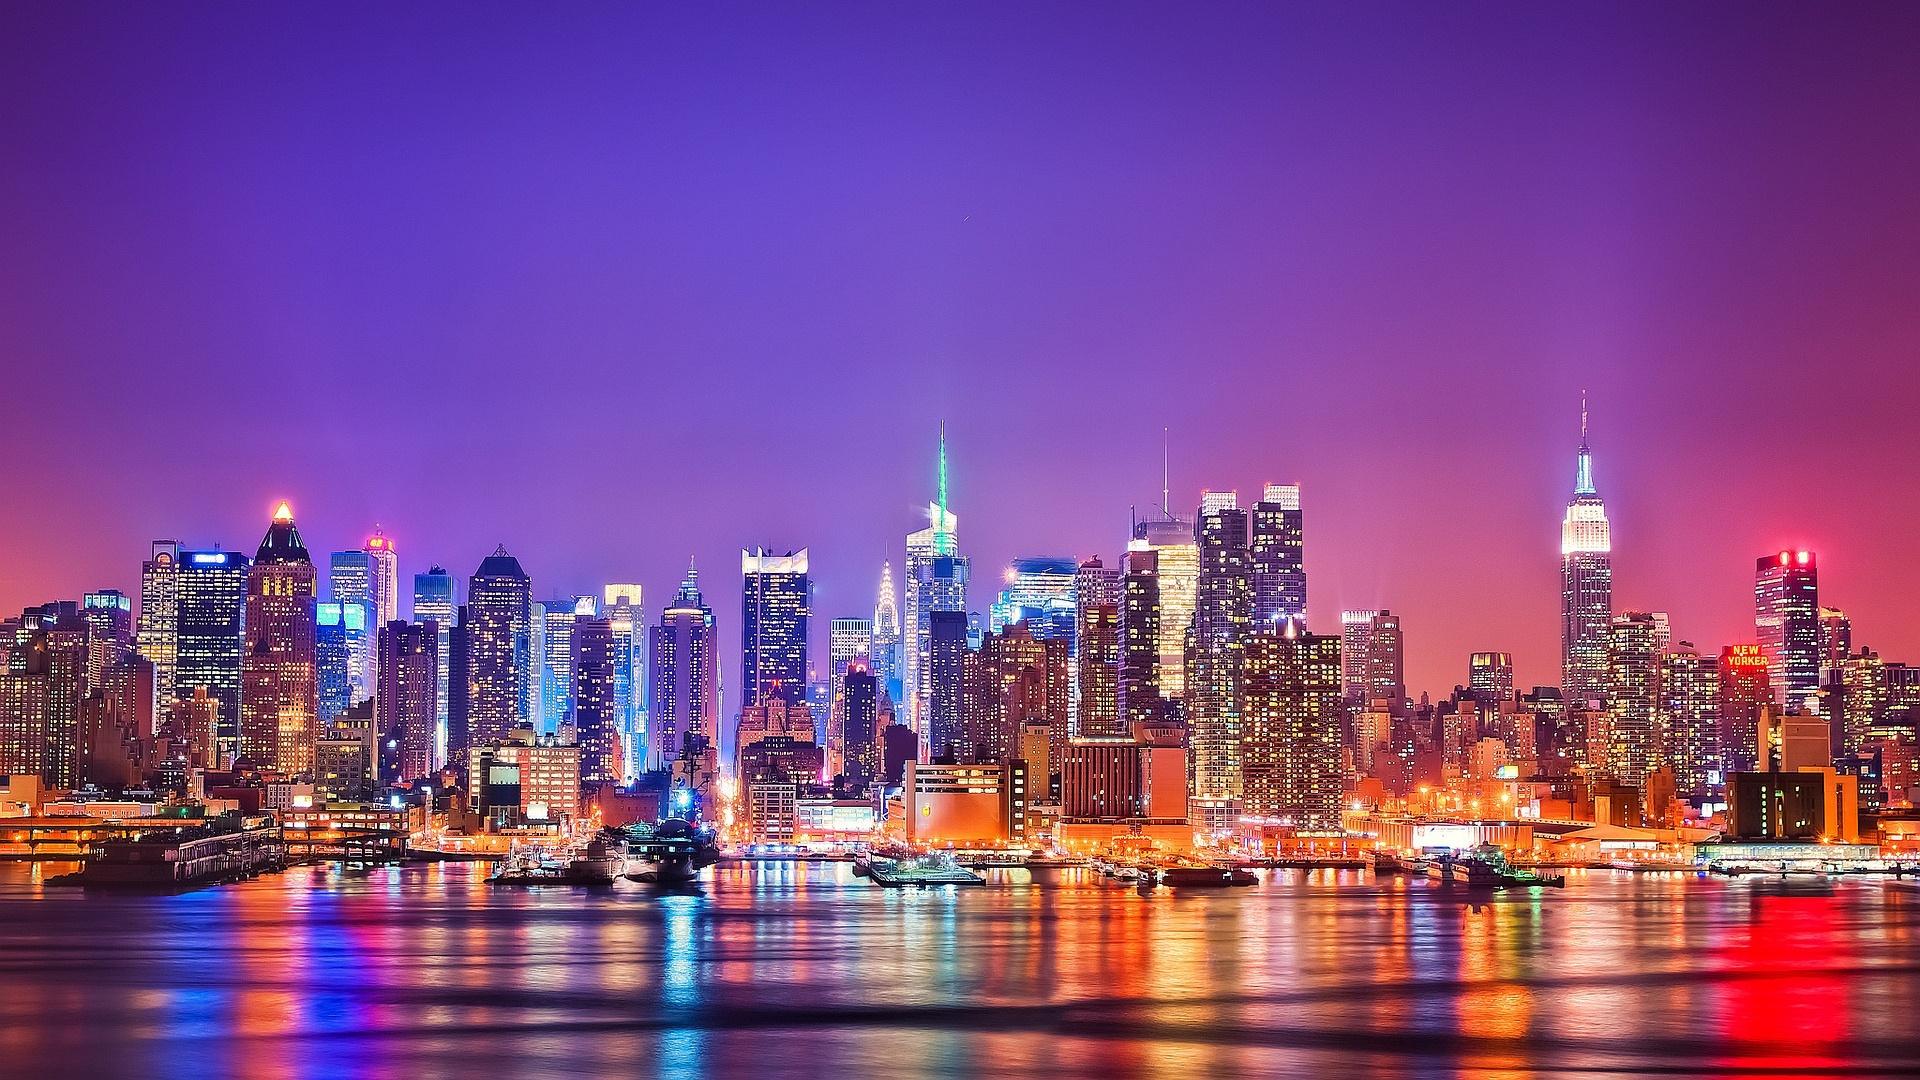 New York City HD Wallpaper & pic